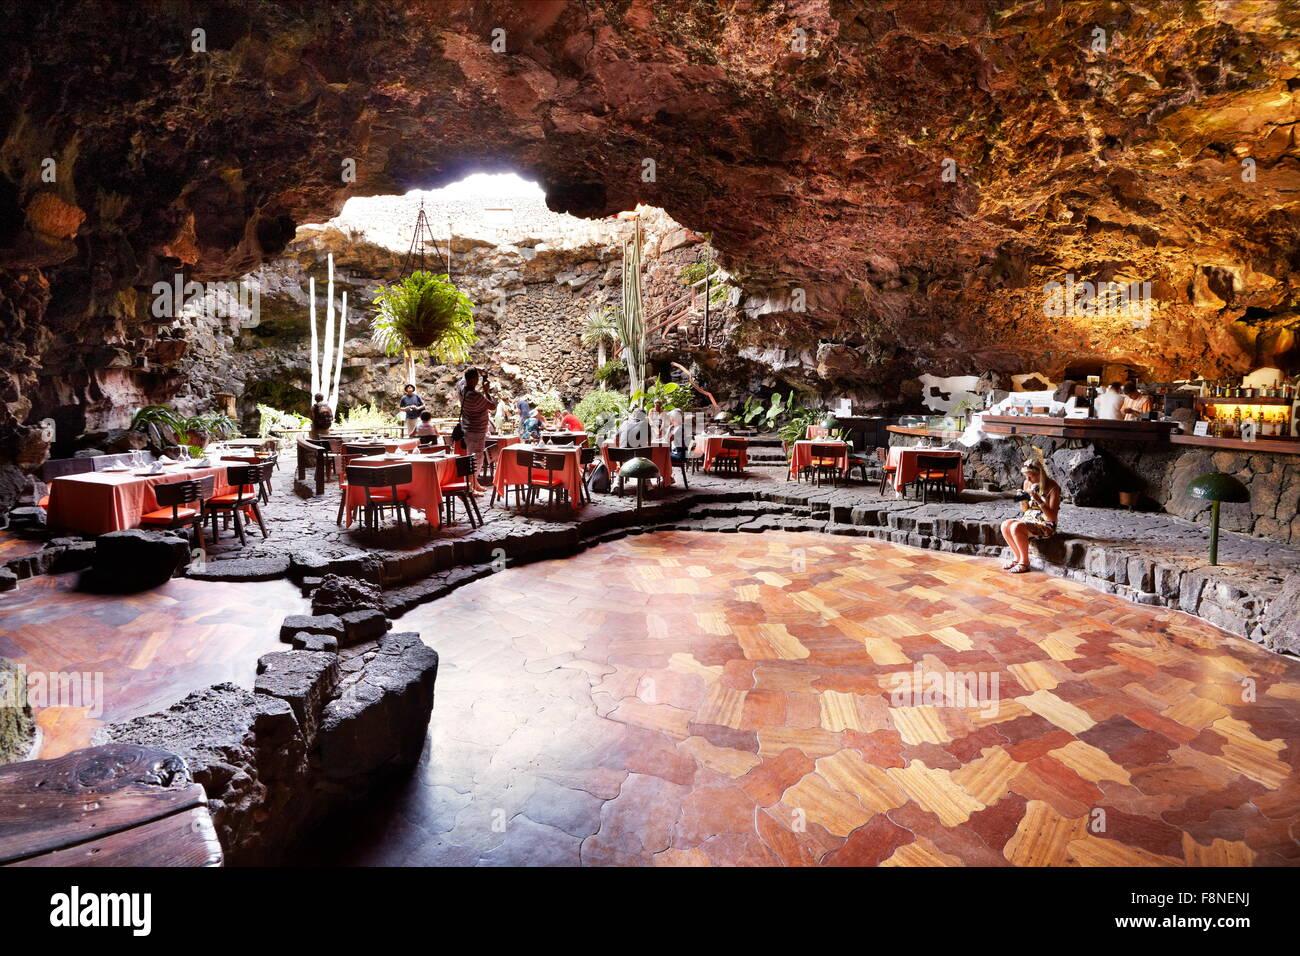 Insel Lanzarote - Jameos del Aqua, Vulkanhöhle, gegründet vom kanarischen Künstler Cesar Manrique, Stockbild